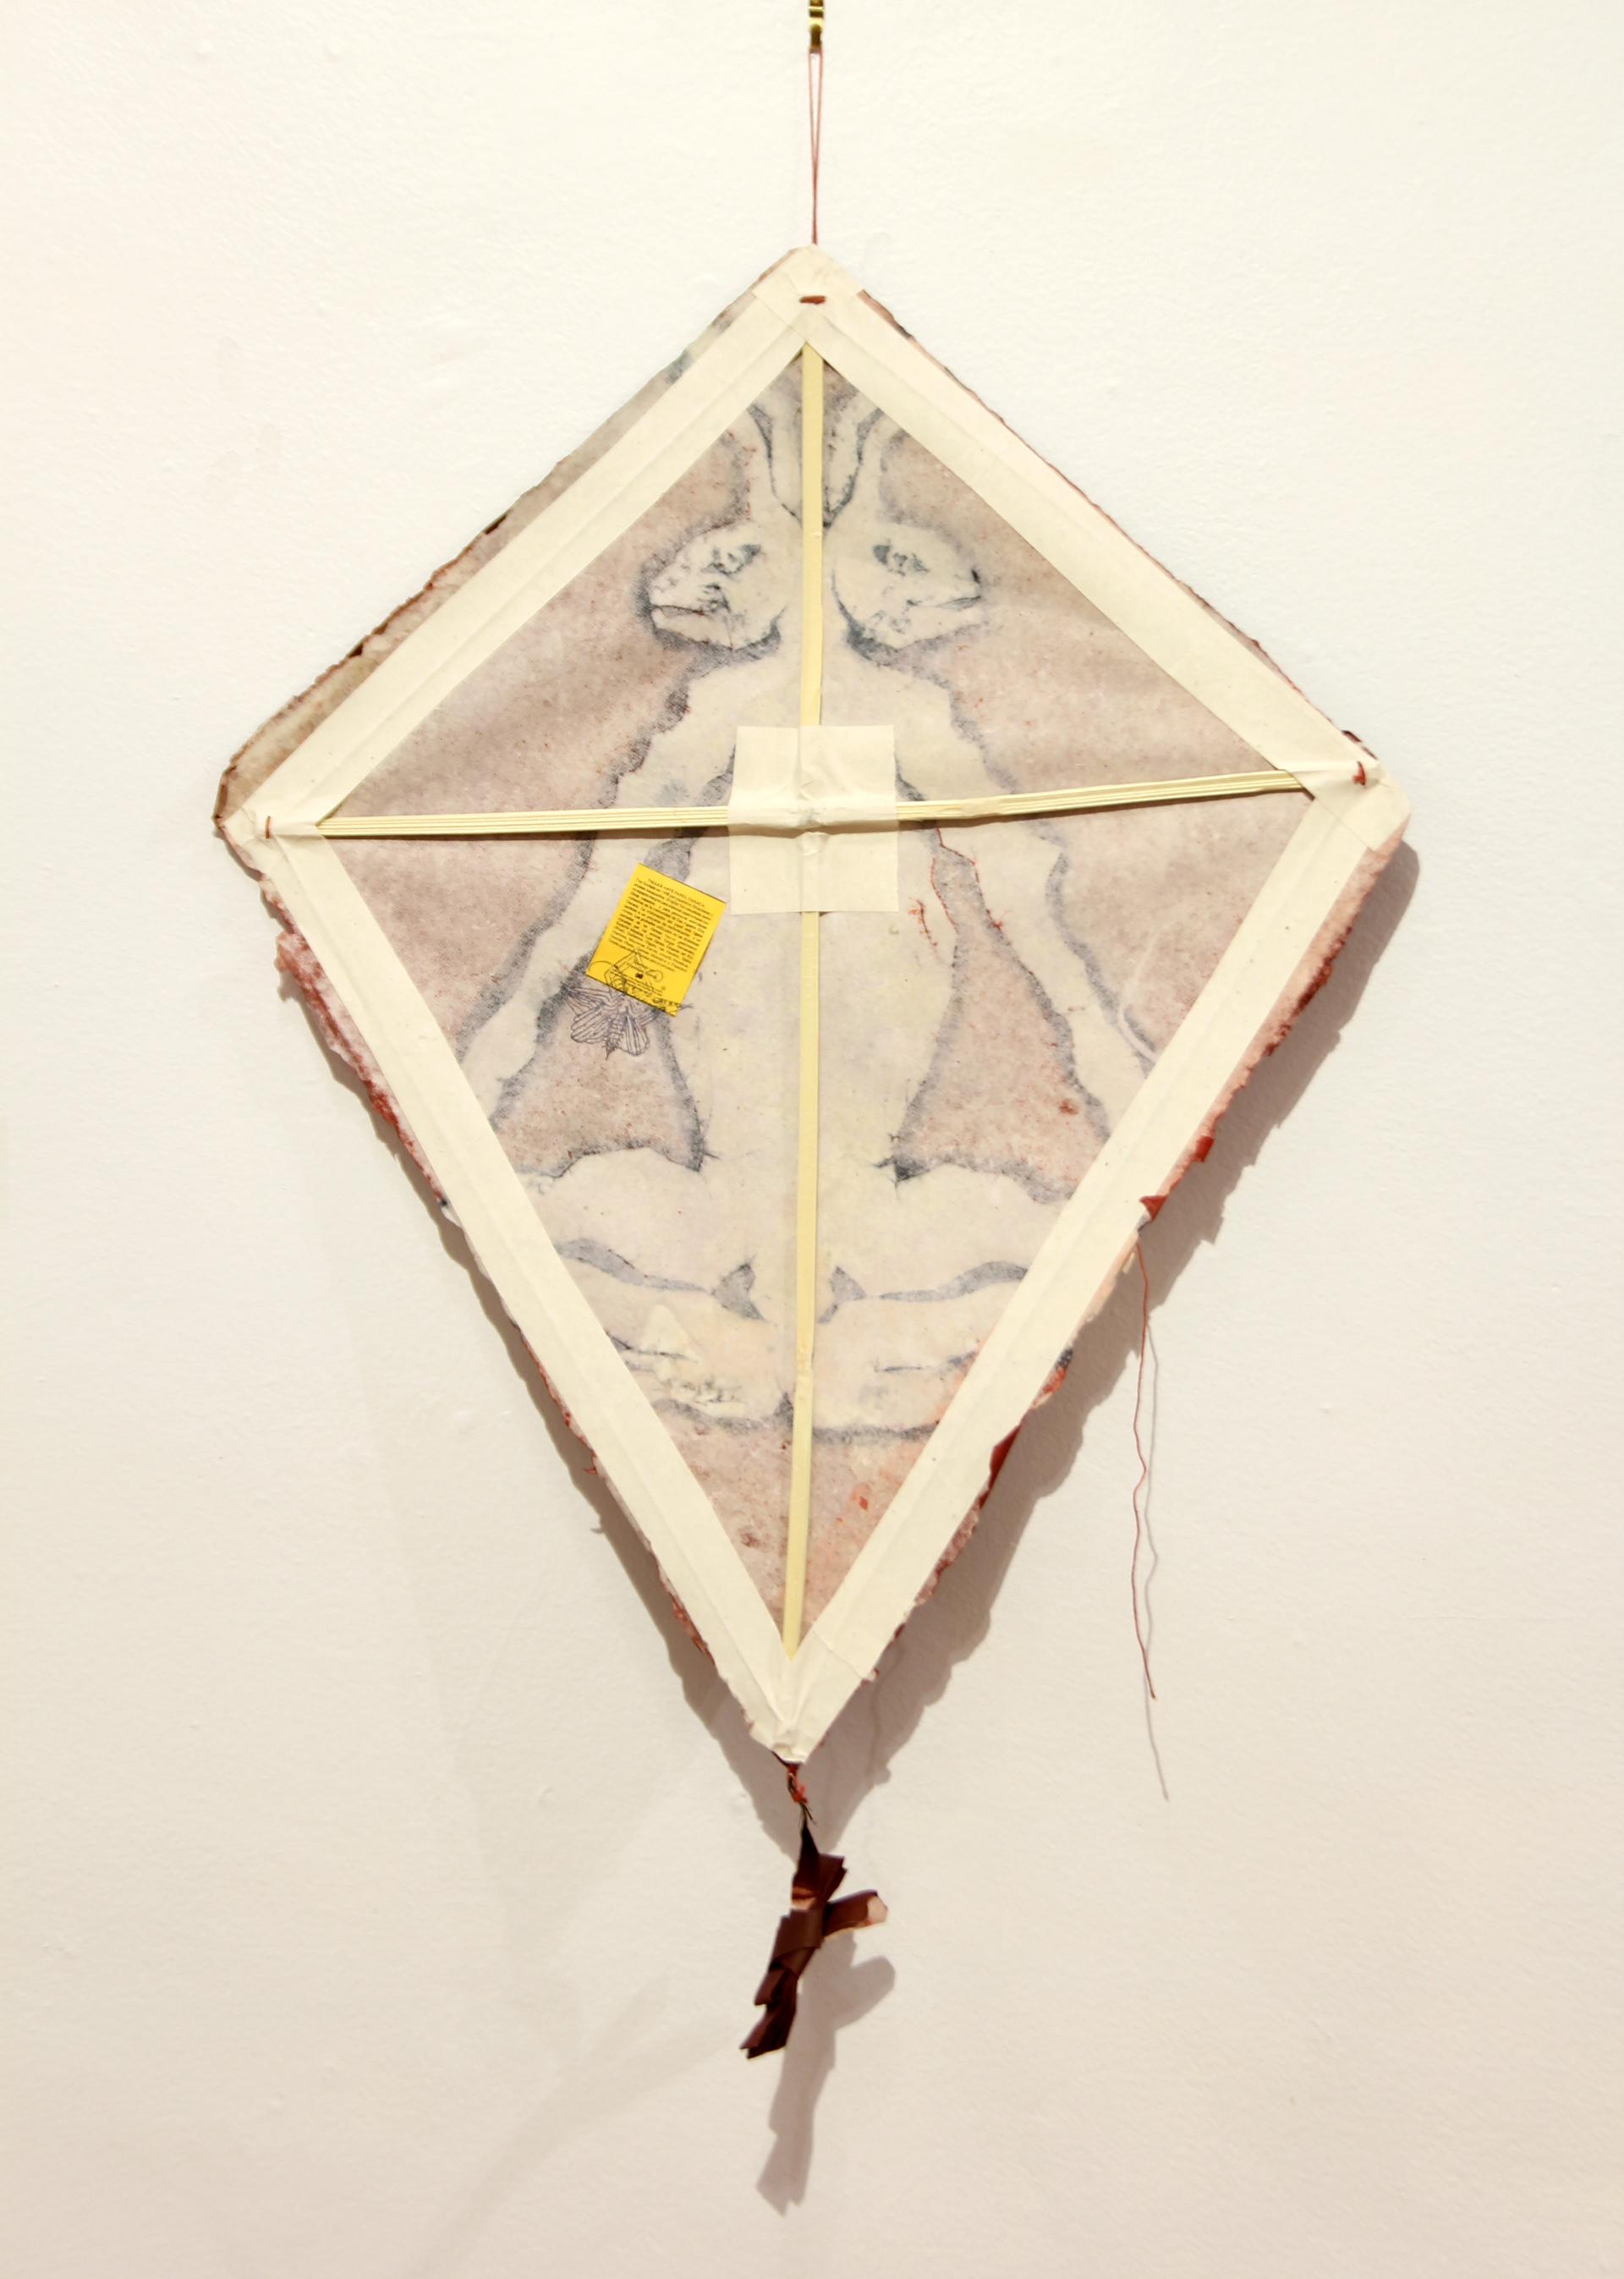 Conejos Kite by Francisco Toledo (1940 - 2019)